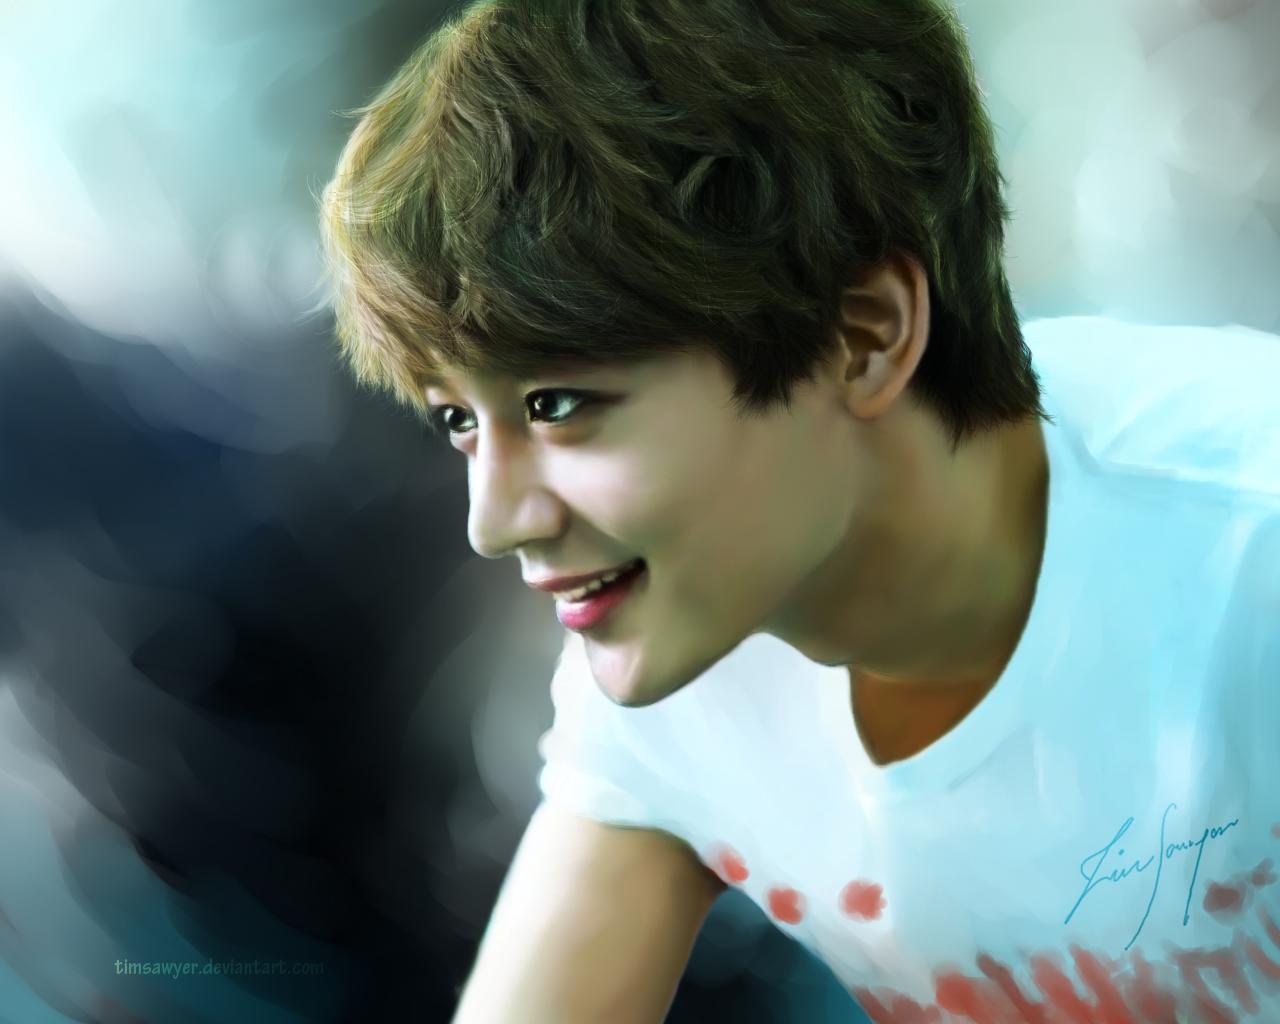 .: Shinee's Minho :. by TimSawyer on DeviantArt